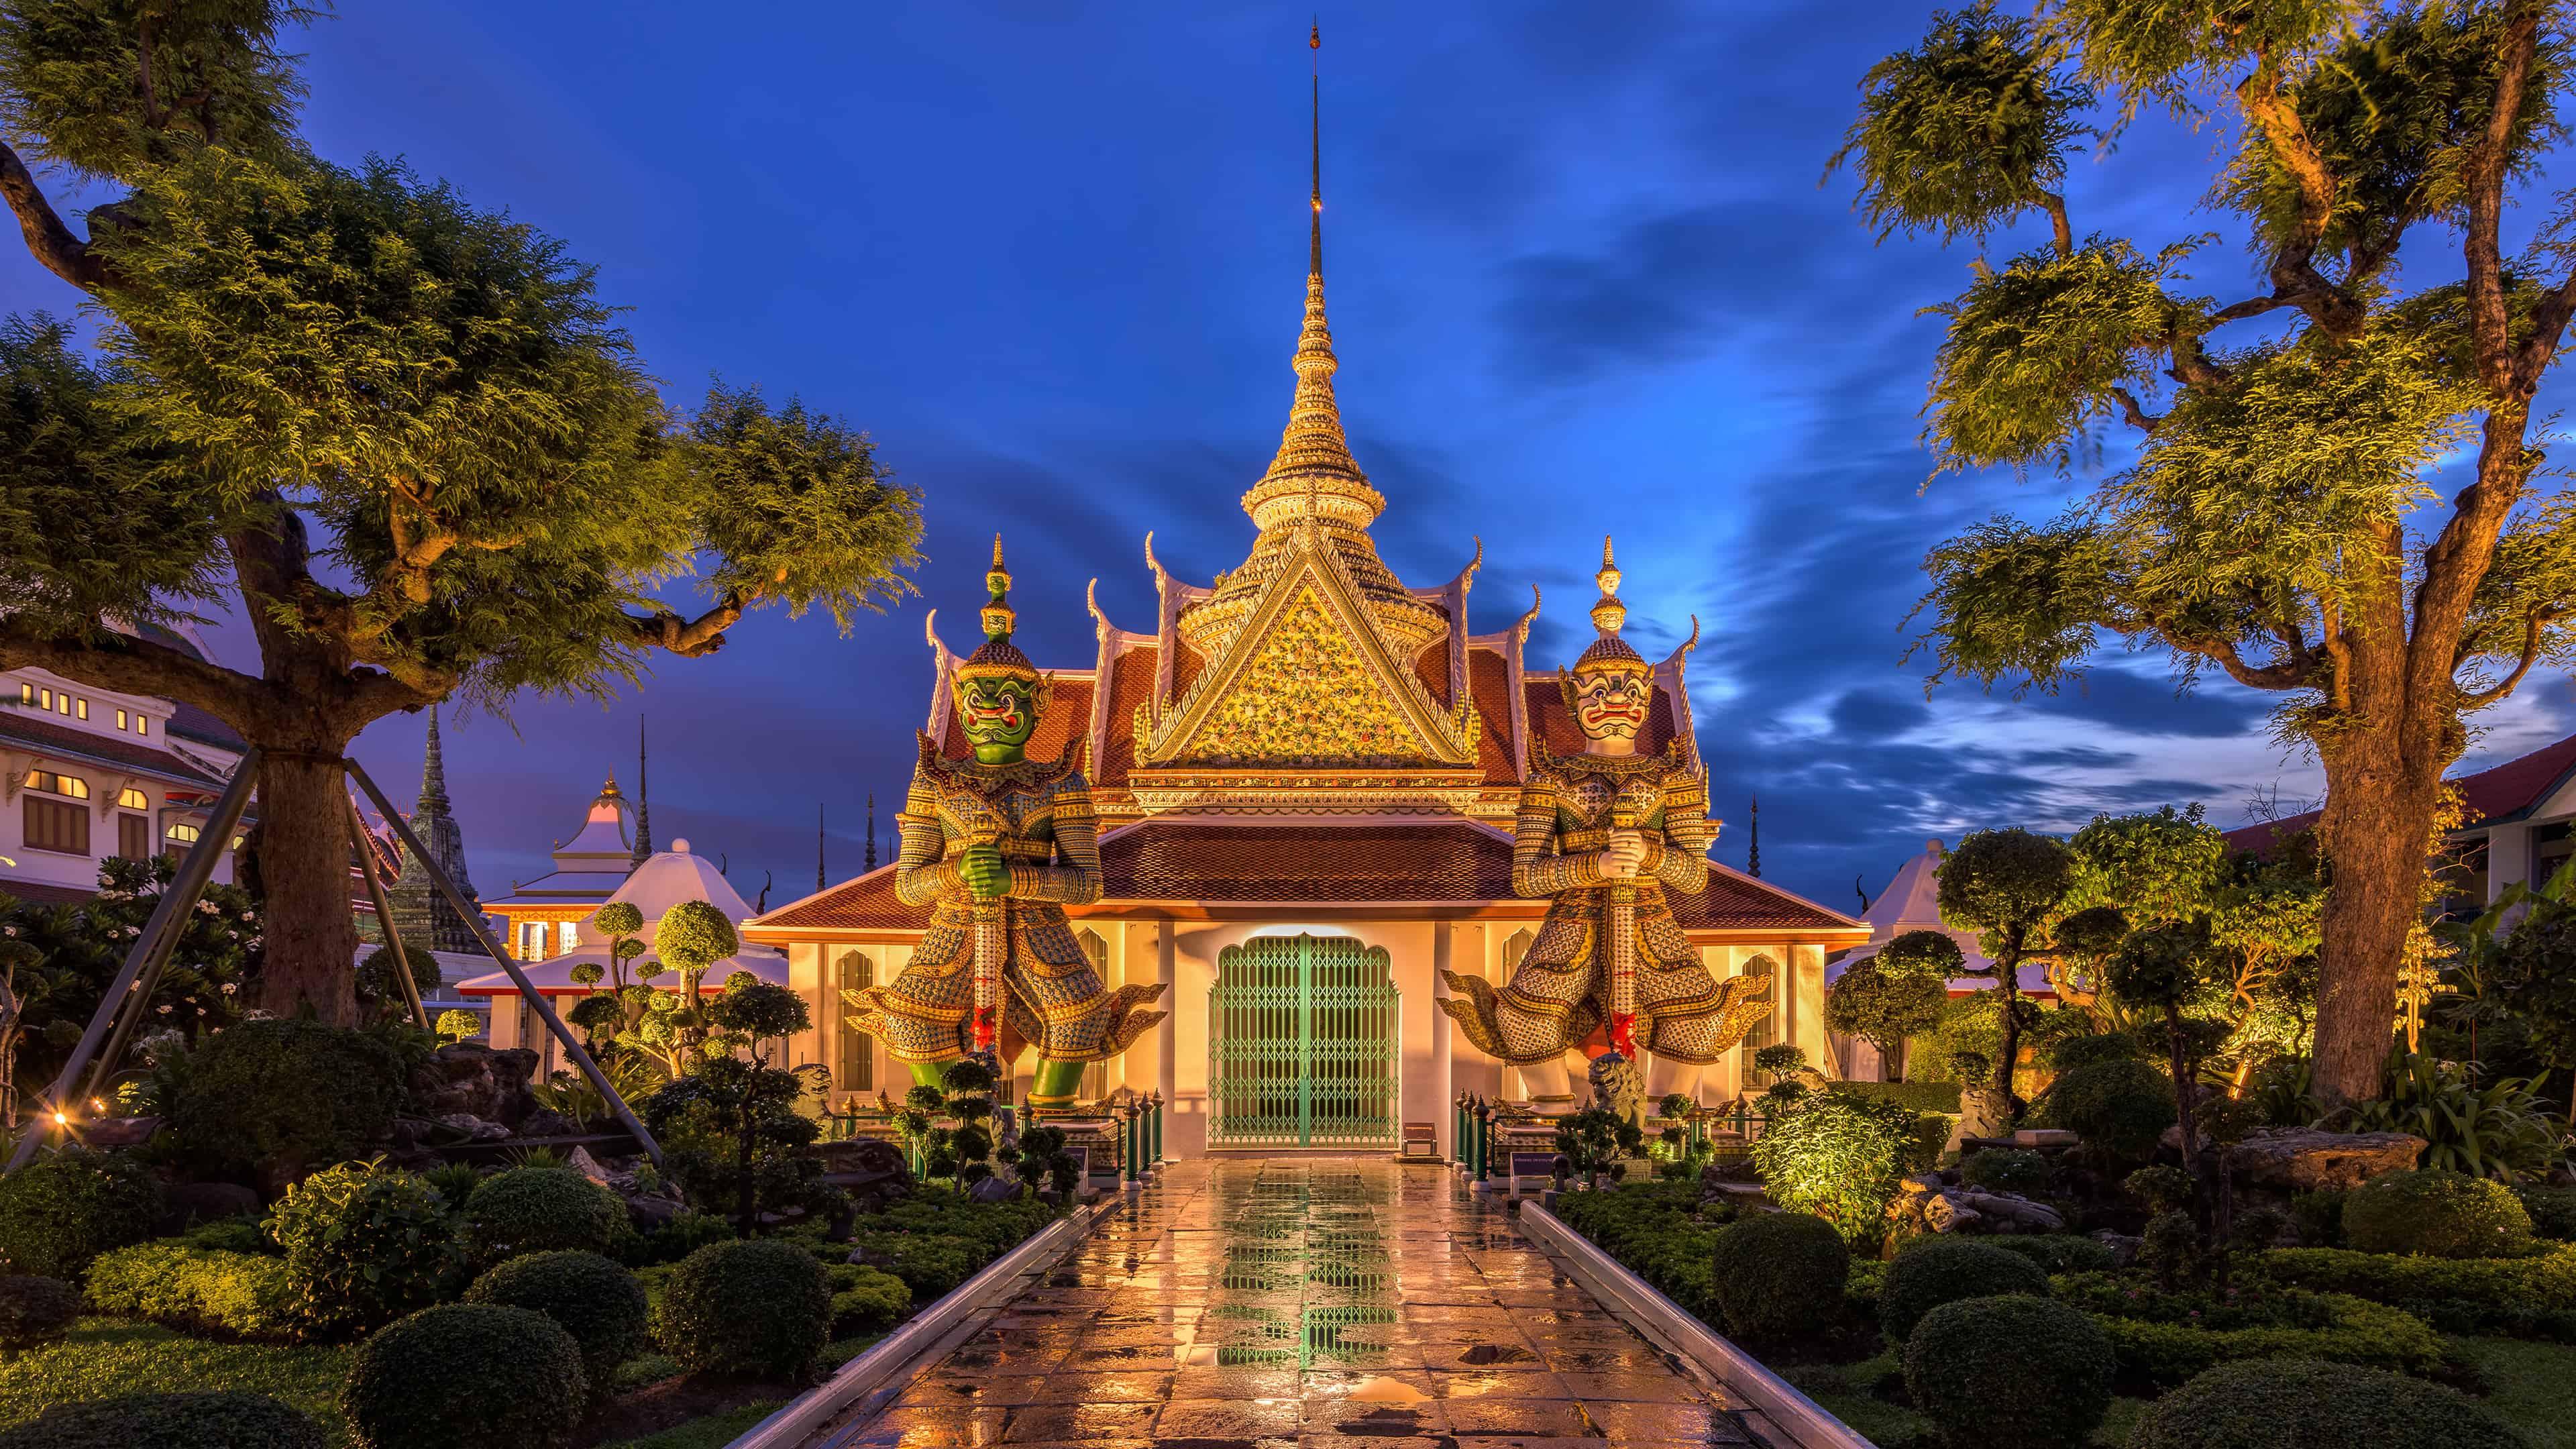 Wat Arun Buddhist Temple Bangkok Thailand Uhd 4k Wallpaper